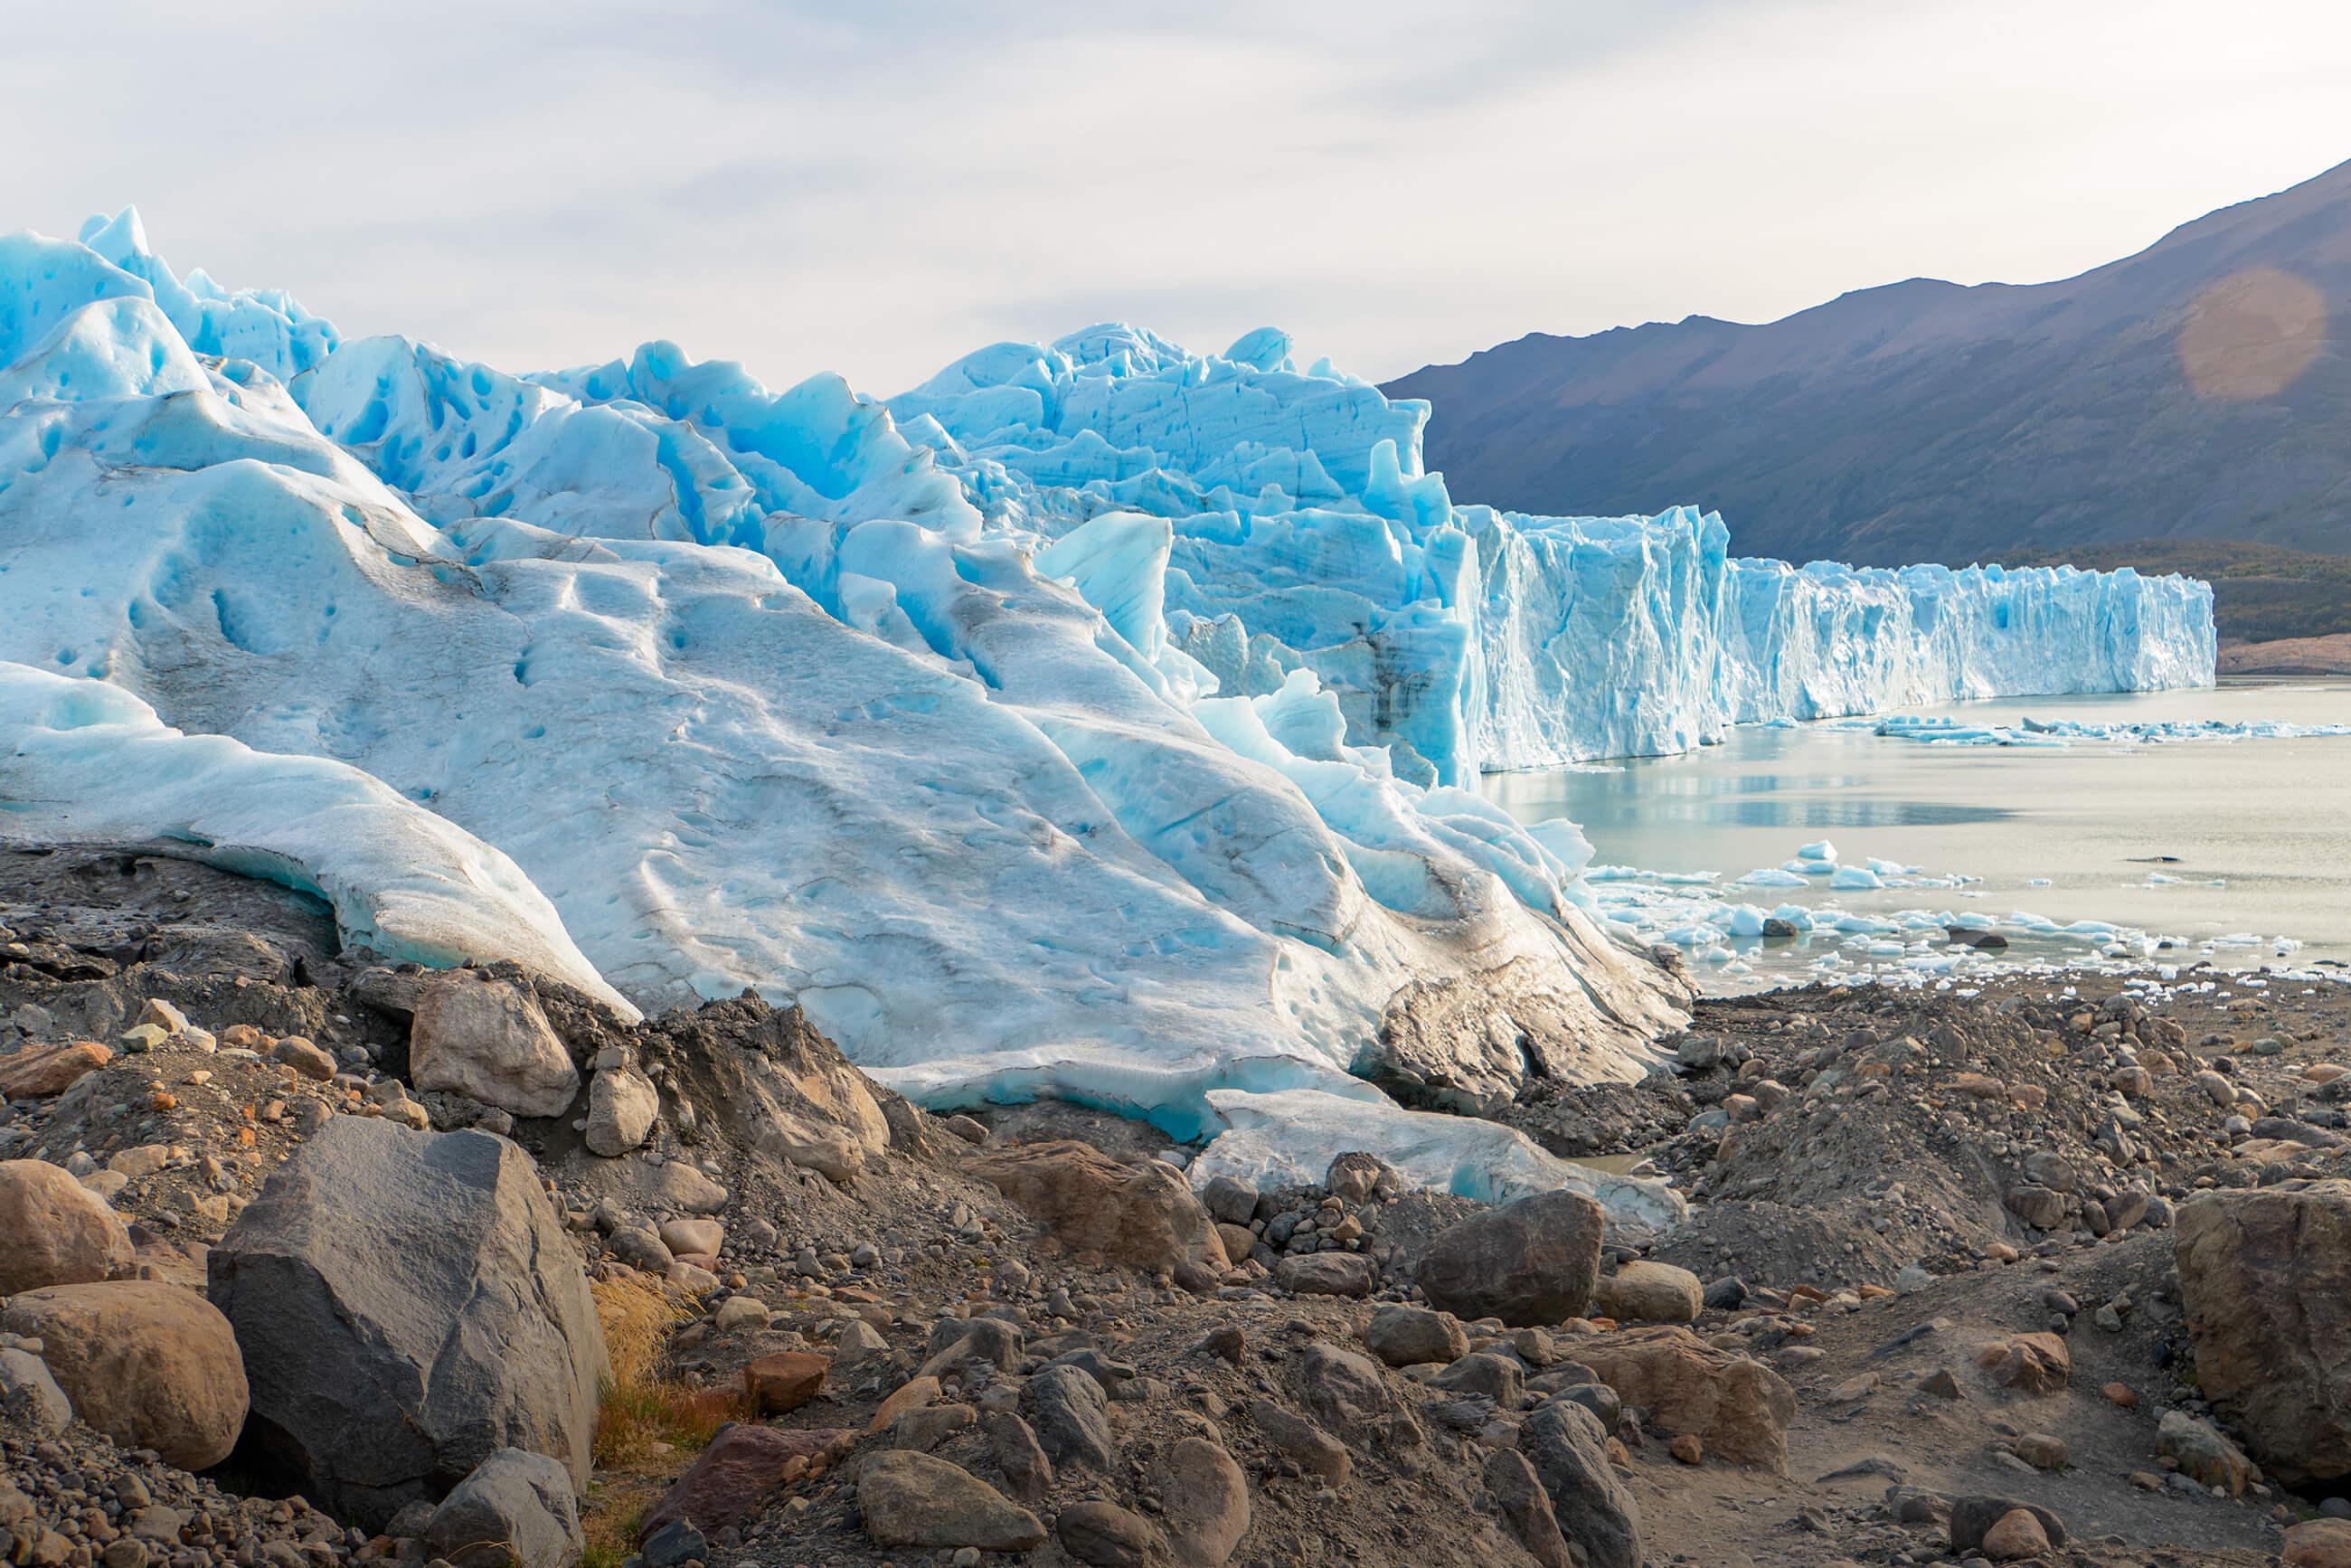 https://bubo.sk/uploads/covery_2019/patagonia.jpg